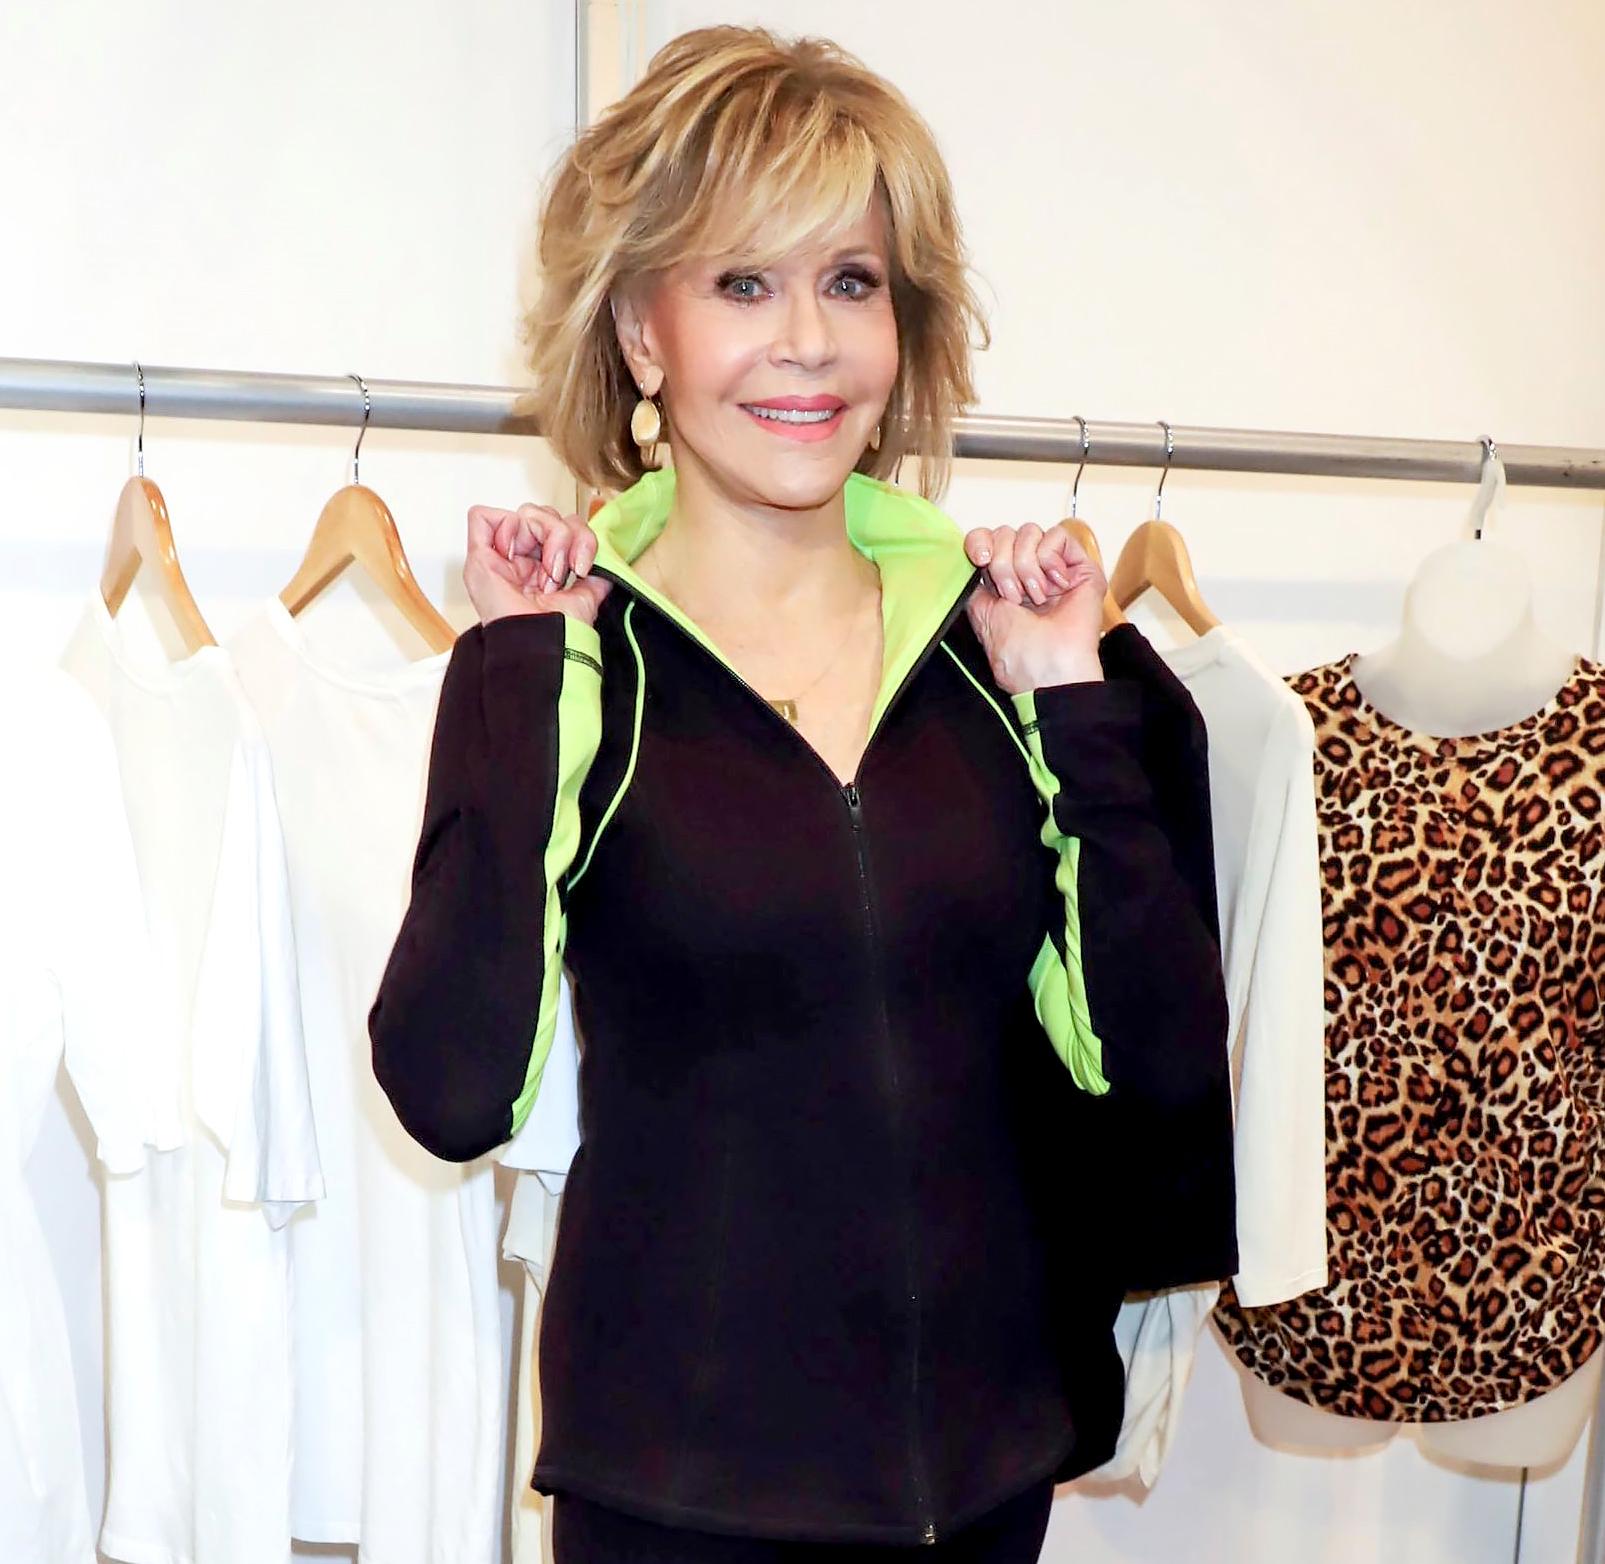 Jane Fonda Revives Her '80s Workout Routine on TikTok